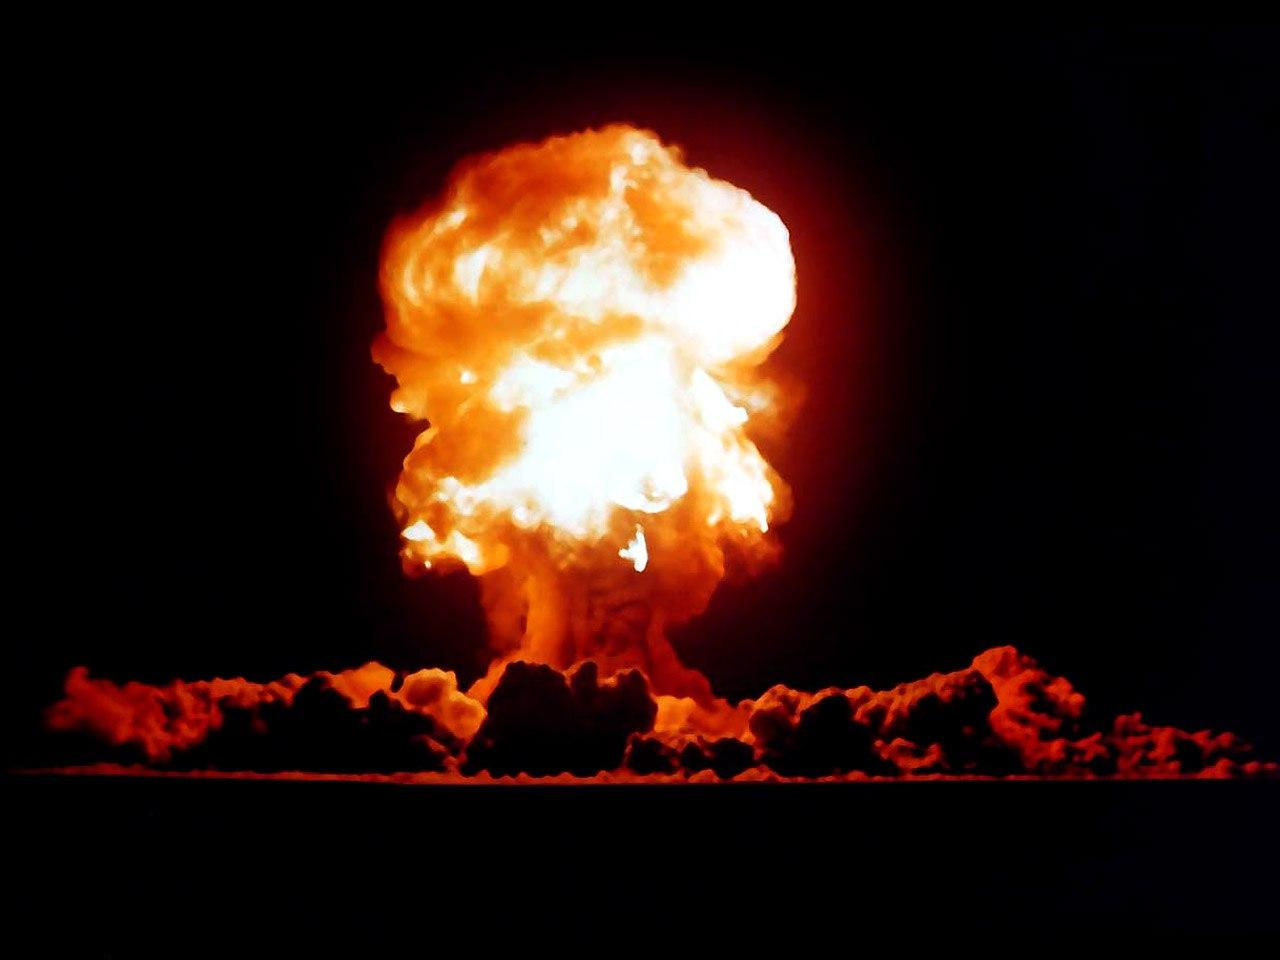 http://4.bp.blogspot.com/-I-Ib71GKrHc/TnpQ60V88wI/AAAAAAAAALY/in6JVKOjAXQ/s1600/atomic_explosion.jpg